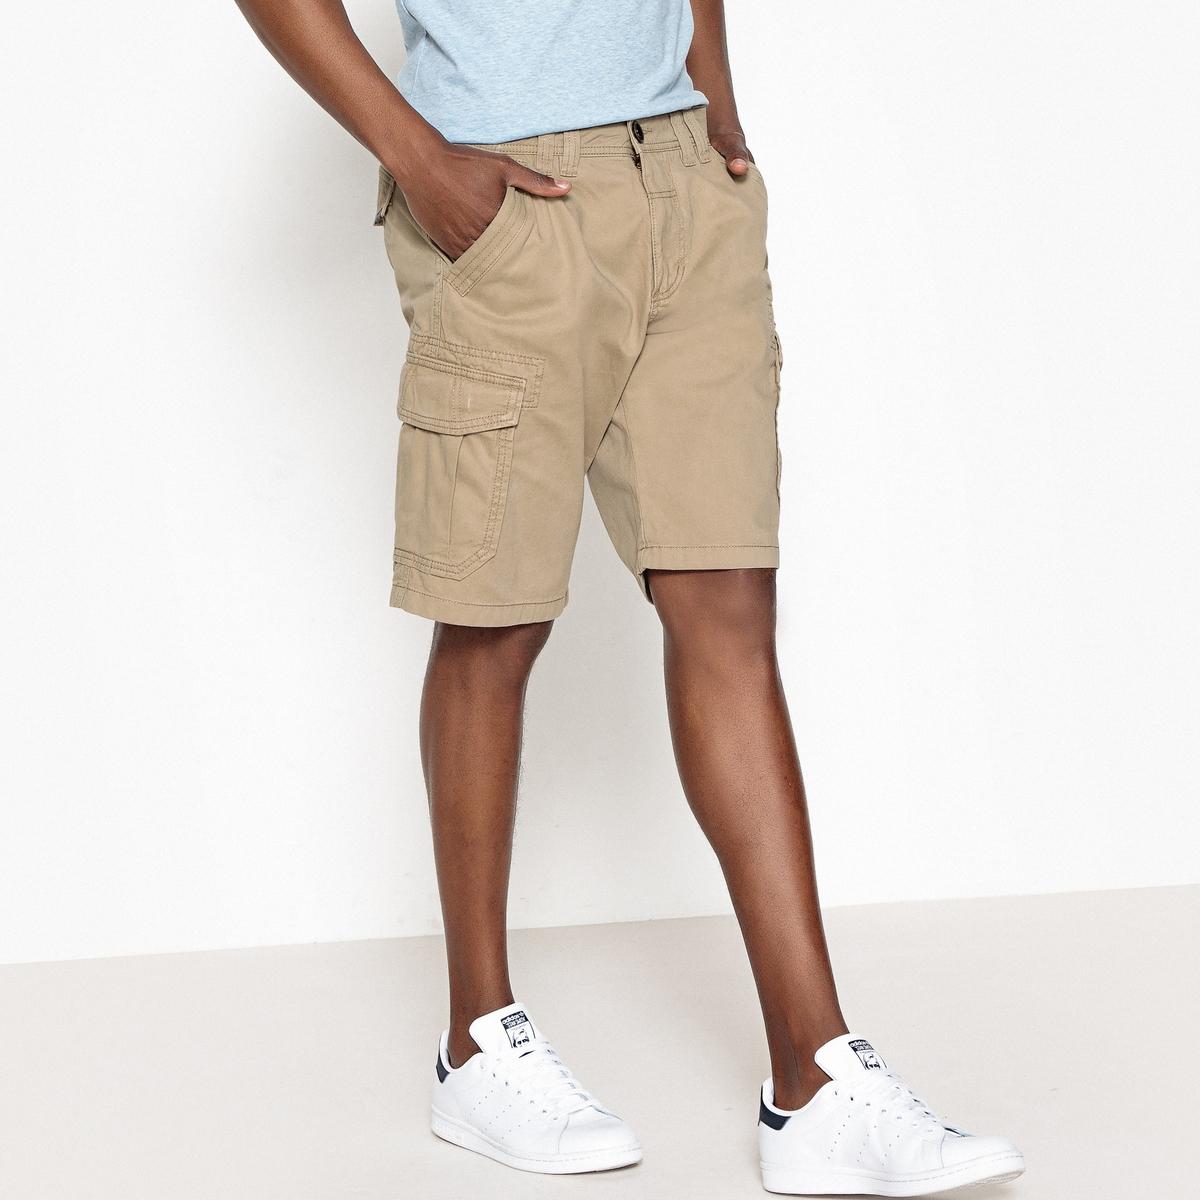 Бермуды-карго Morris Pants Cre